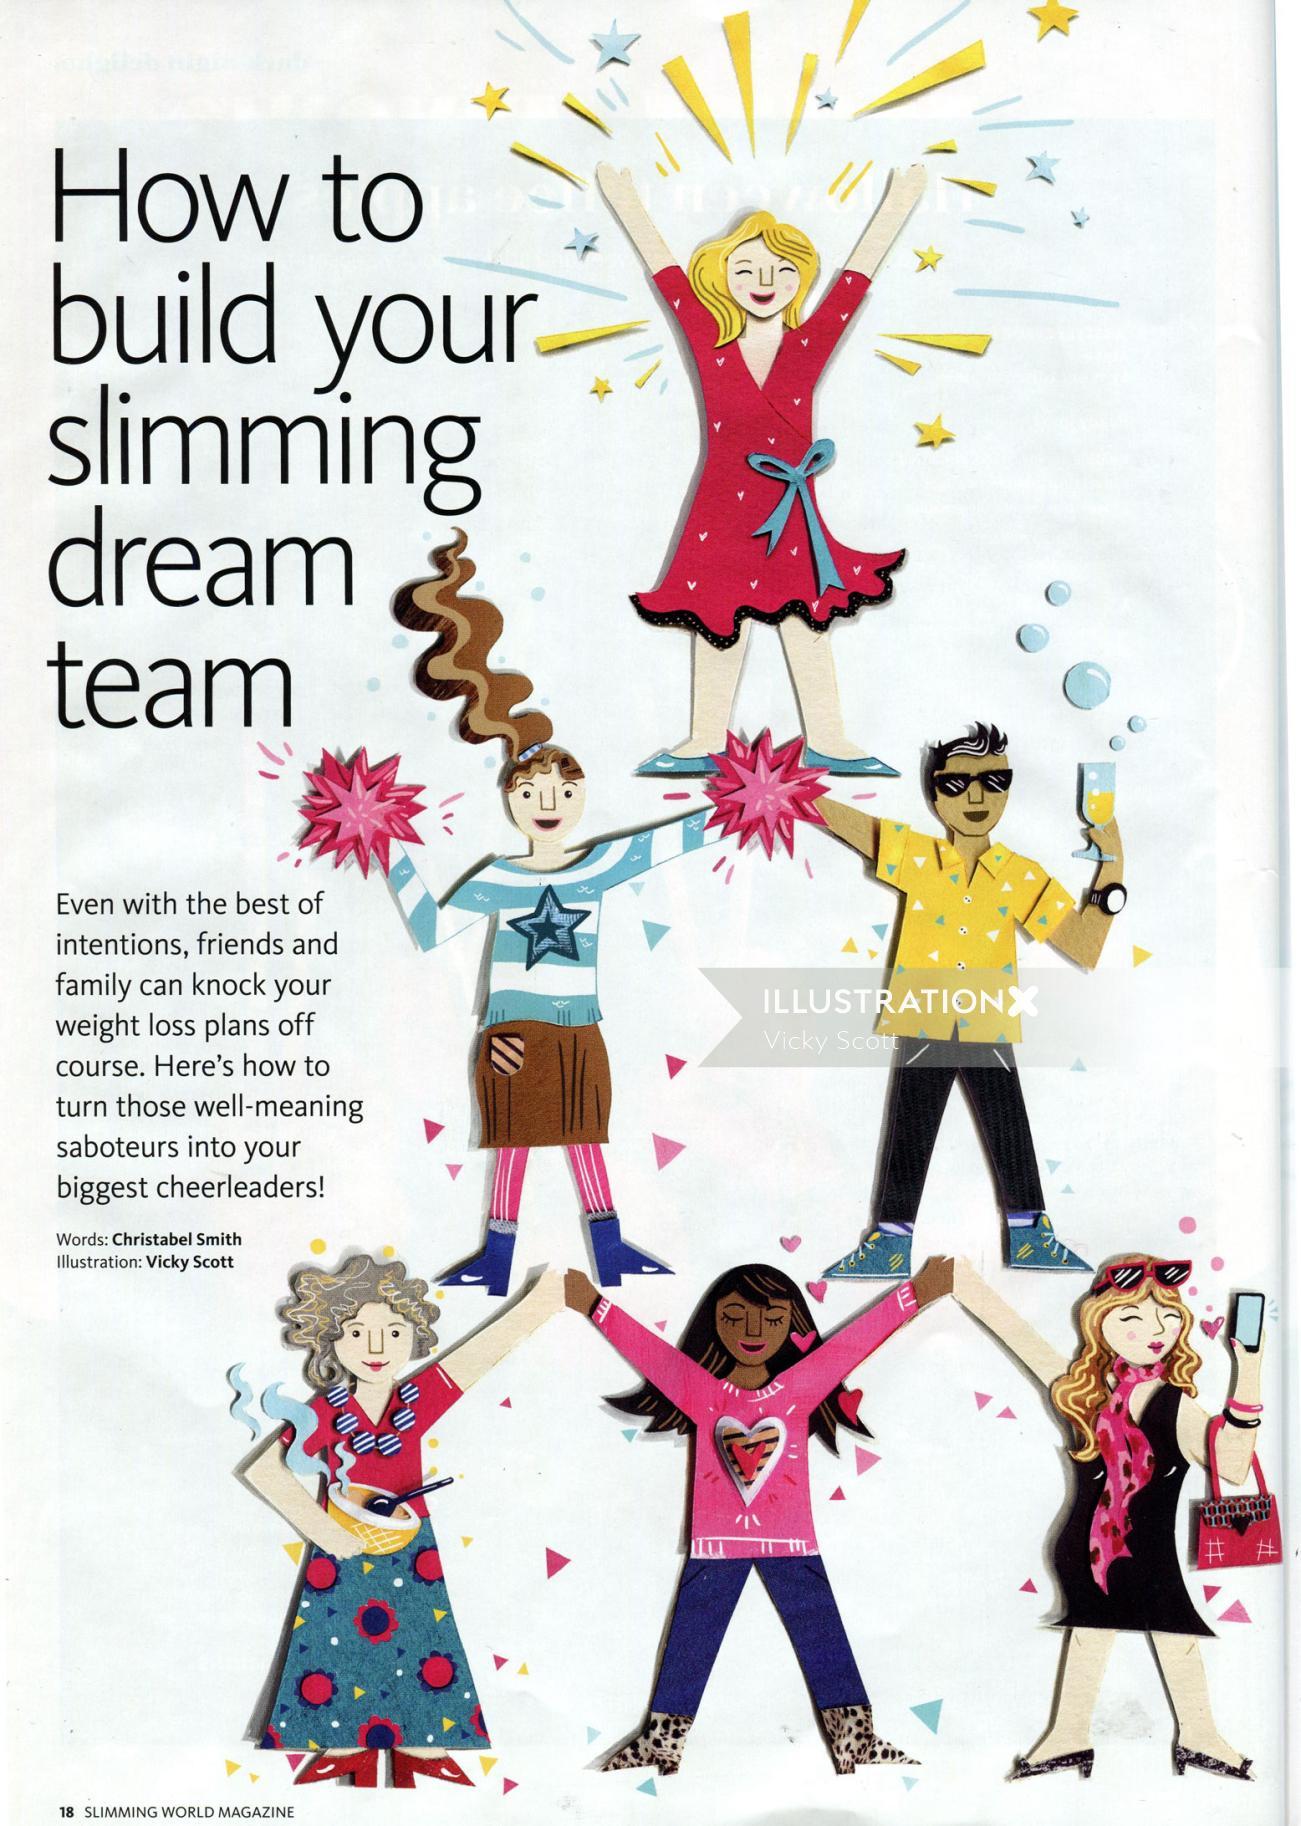 women, paper dolls, cheerleaders, slimming, health, fashion, selfie, wine, diet